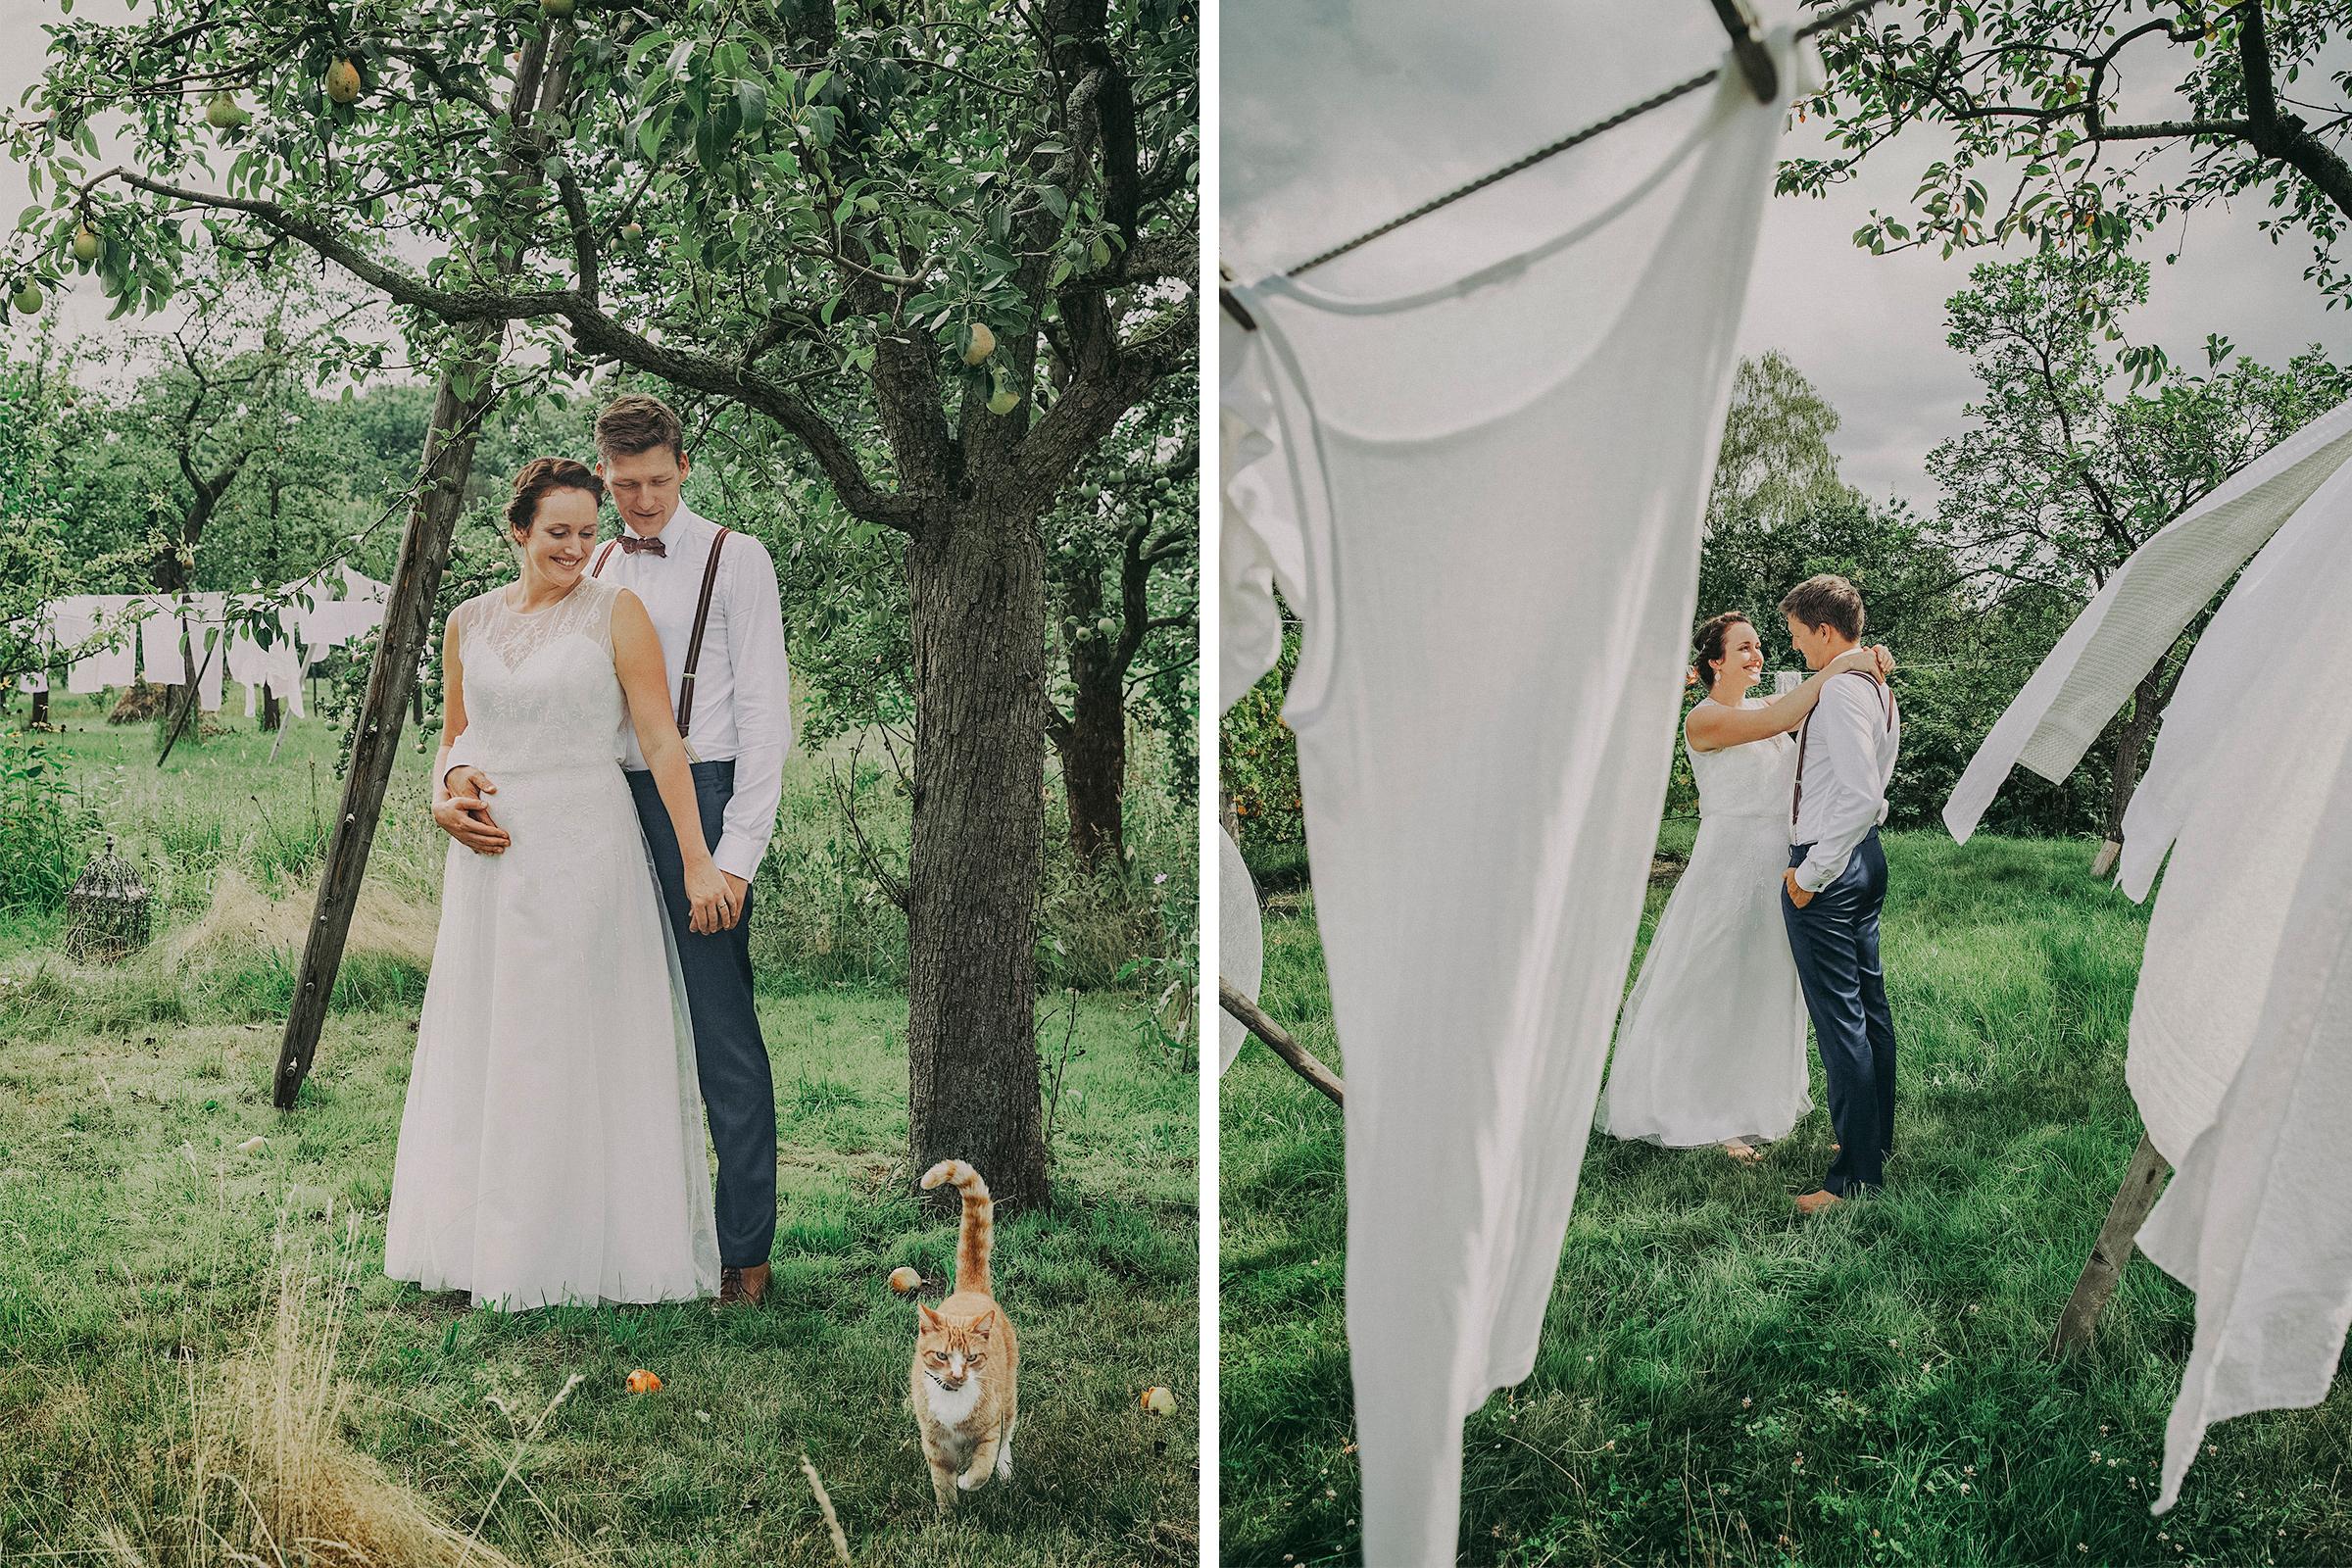 Hochzeit_Potsdam_fotograf_G21